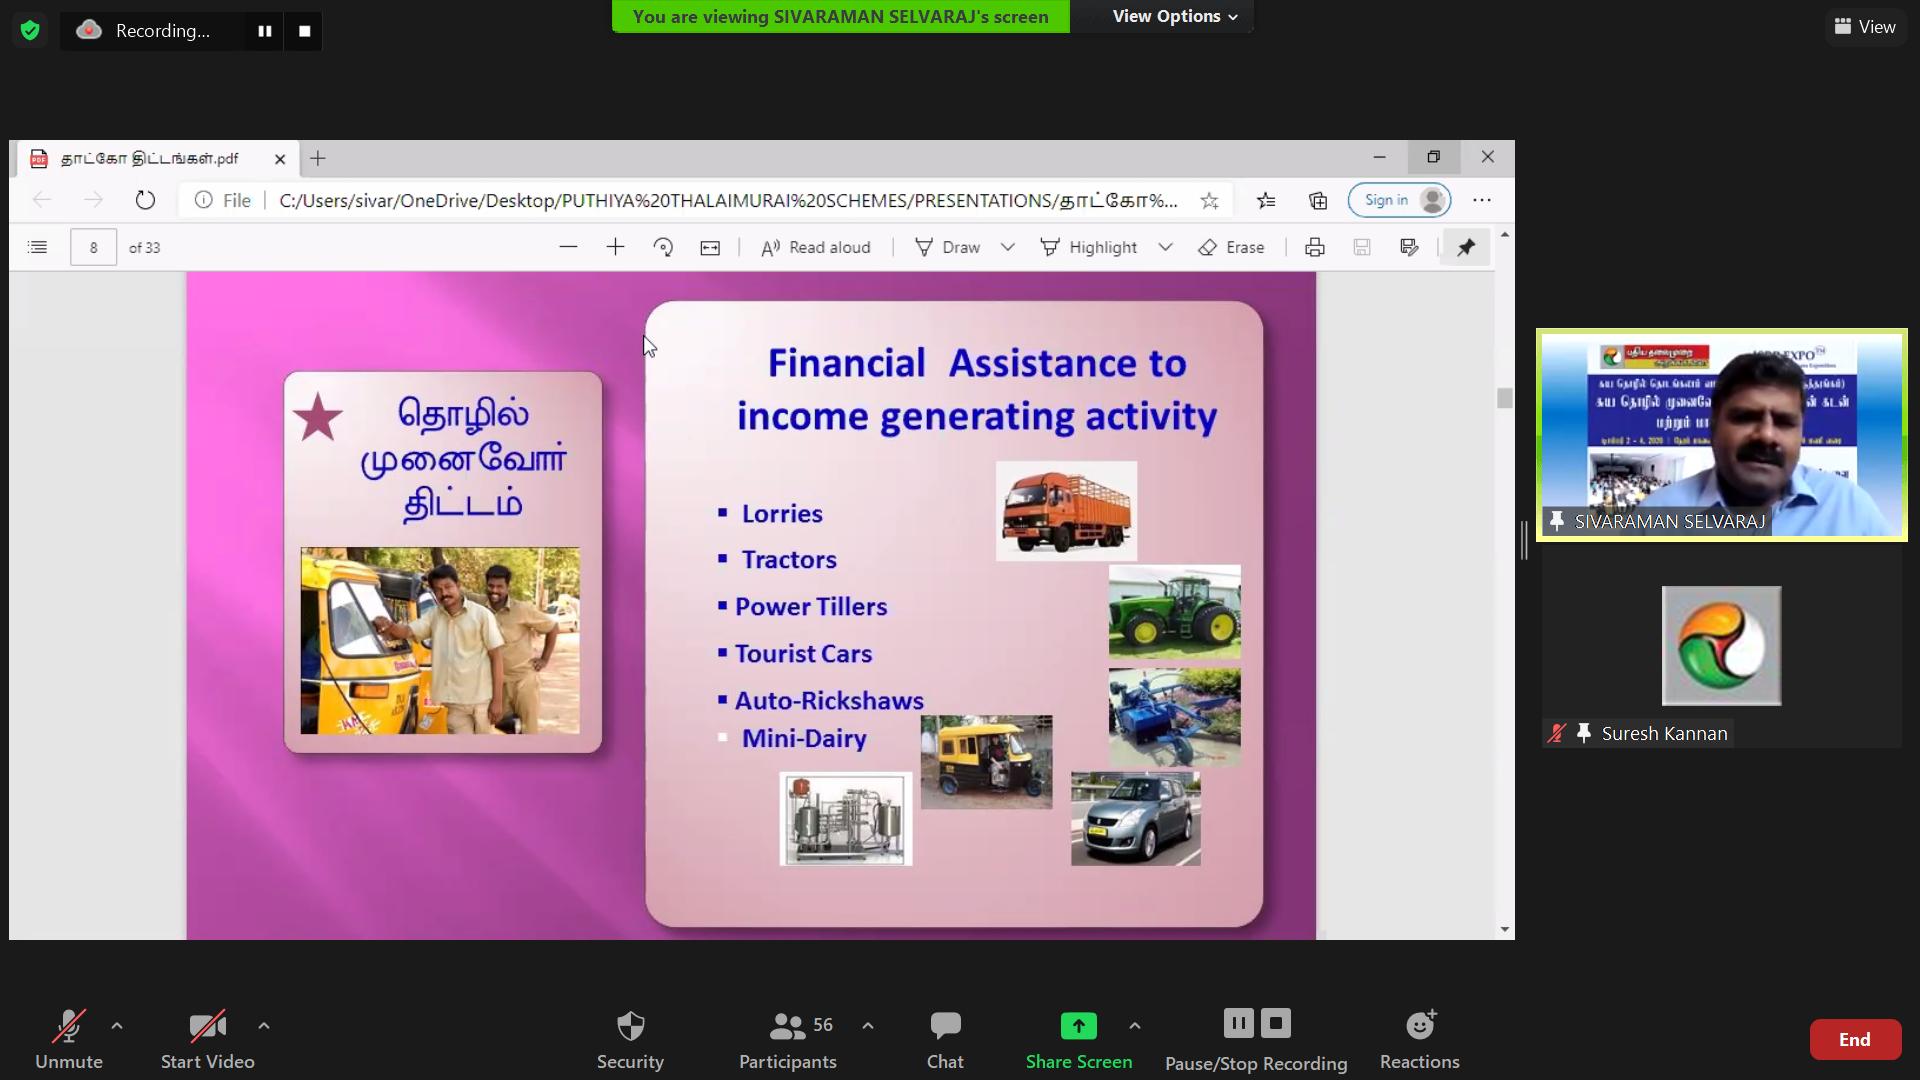 Financial Assistacne